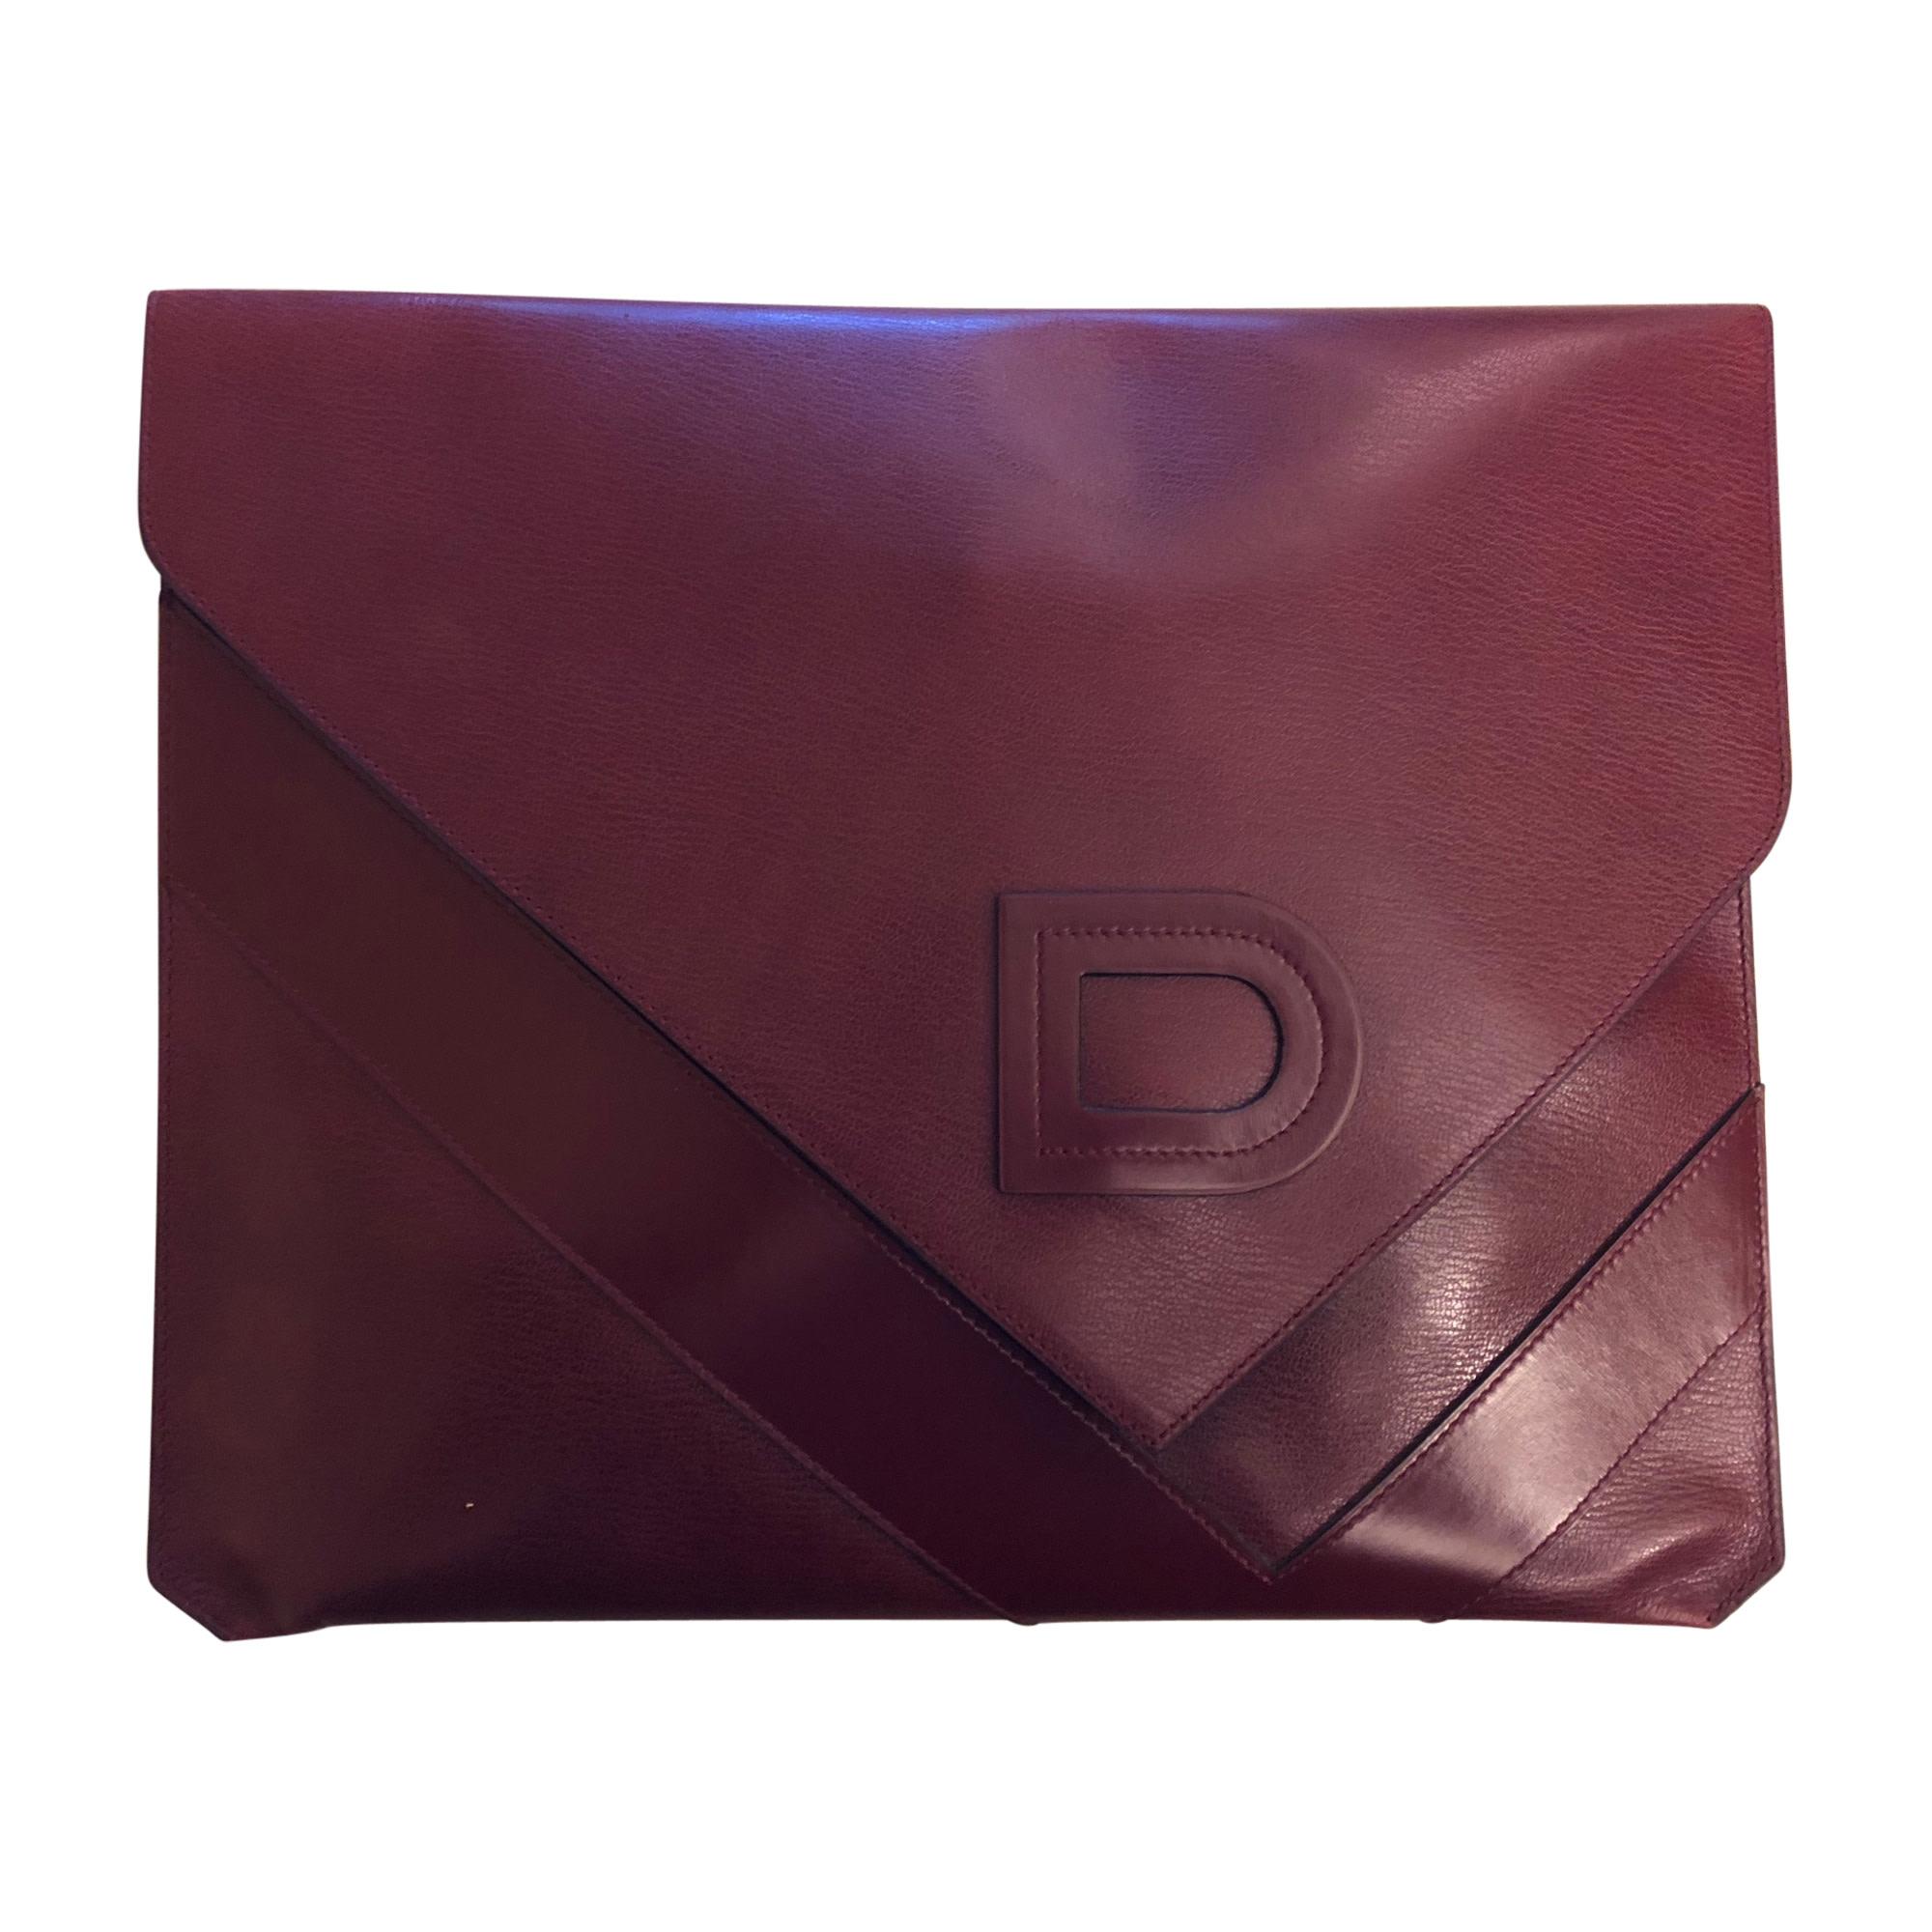 Sac pochette en cuir DELVAUX cuir rouge